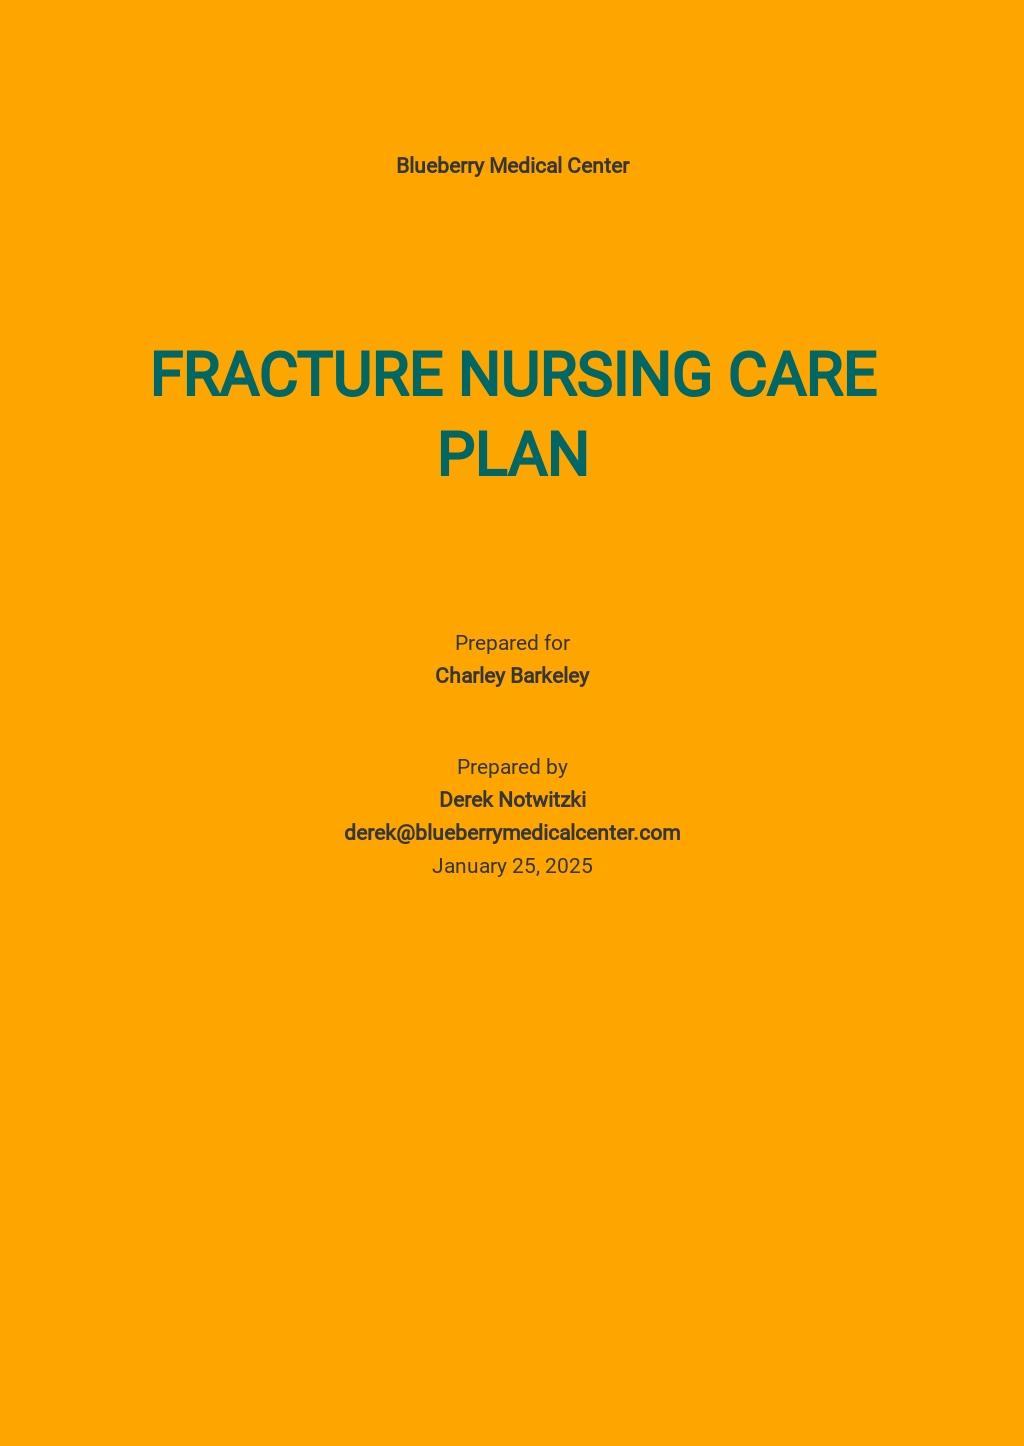 Sample Nursing Care Plan Template